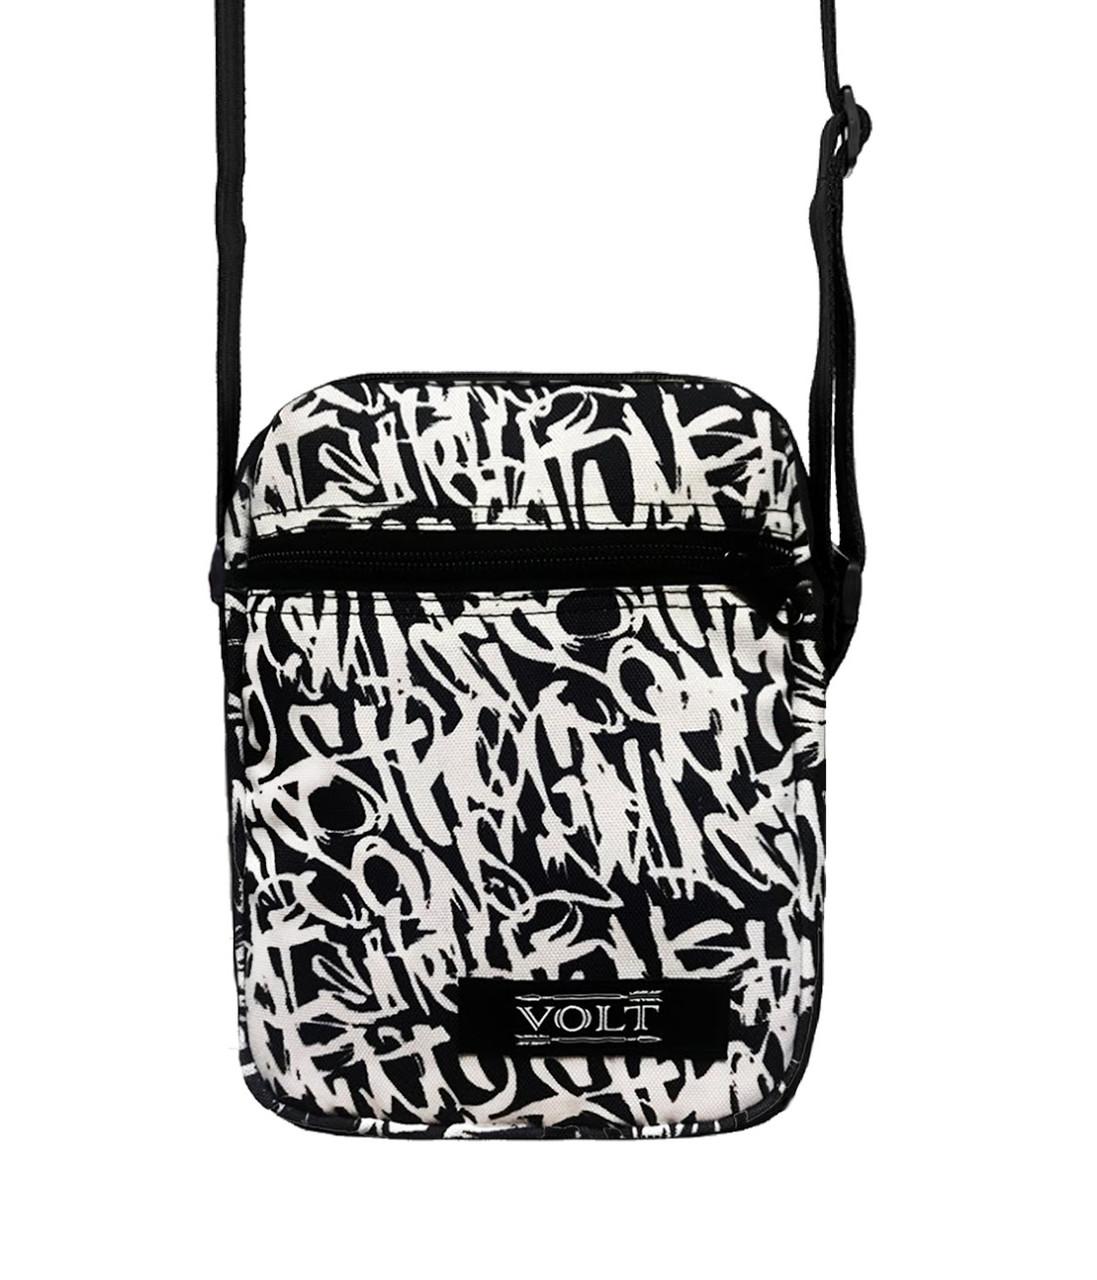 Месенджер VOLT FP Street Graffiti сумка через плече